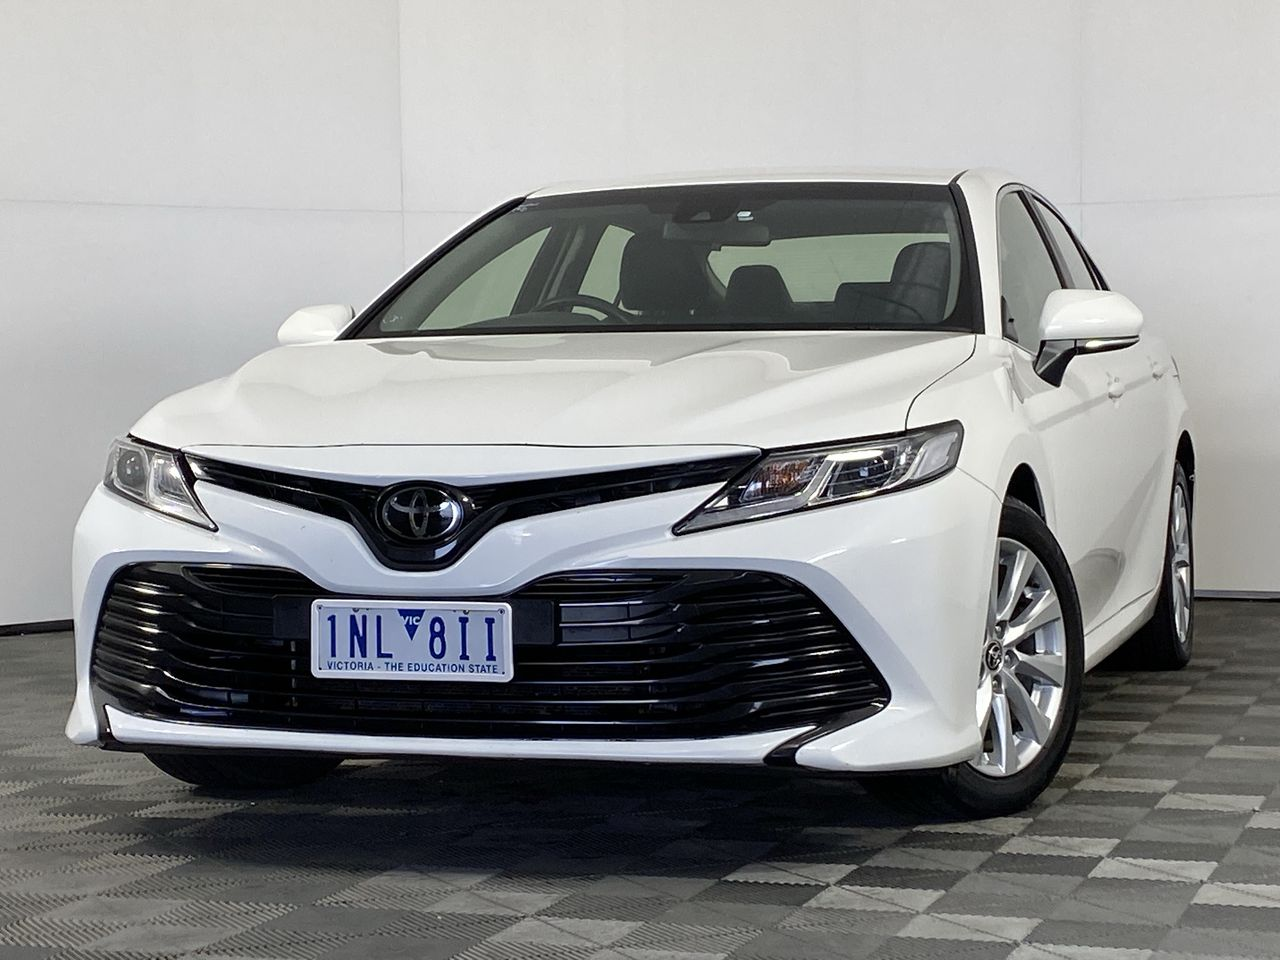 2018 Toyota Camry Ascent ASV70R Automatic Sedan